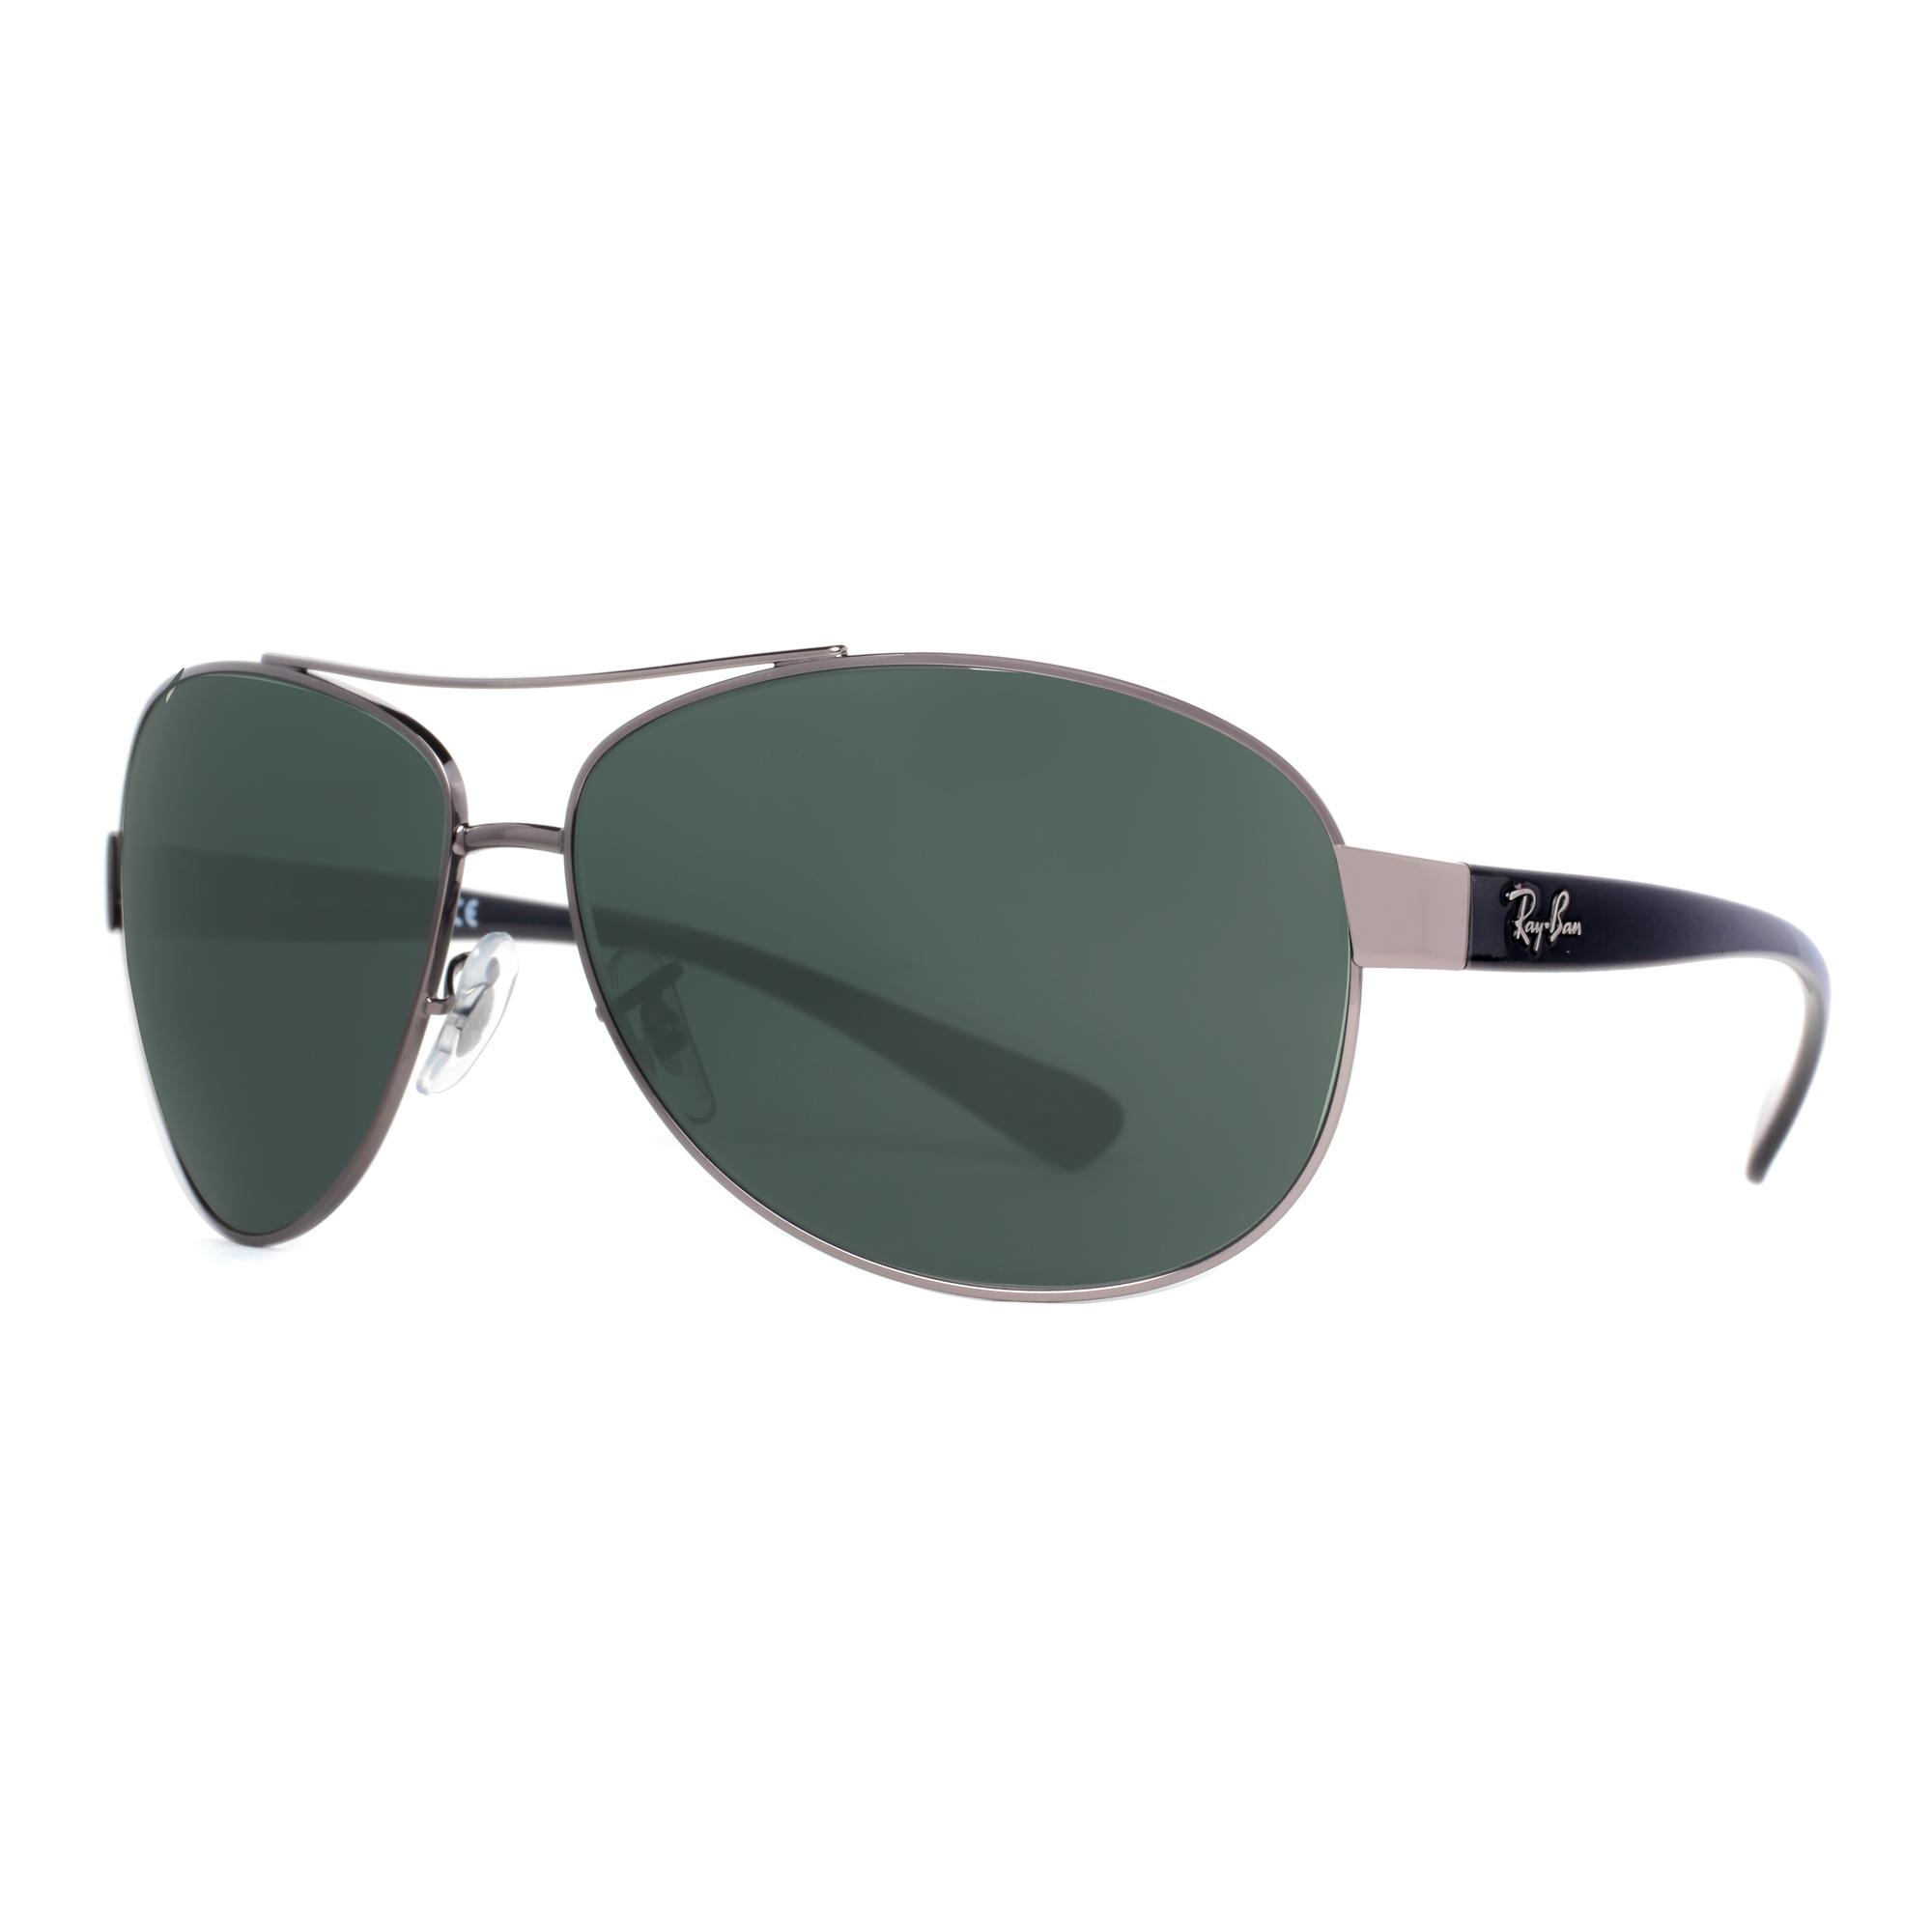 c30d78c43e9f Gift Card For Sunglasses